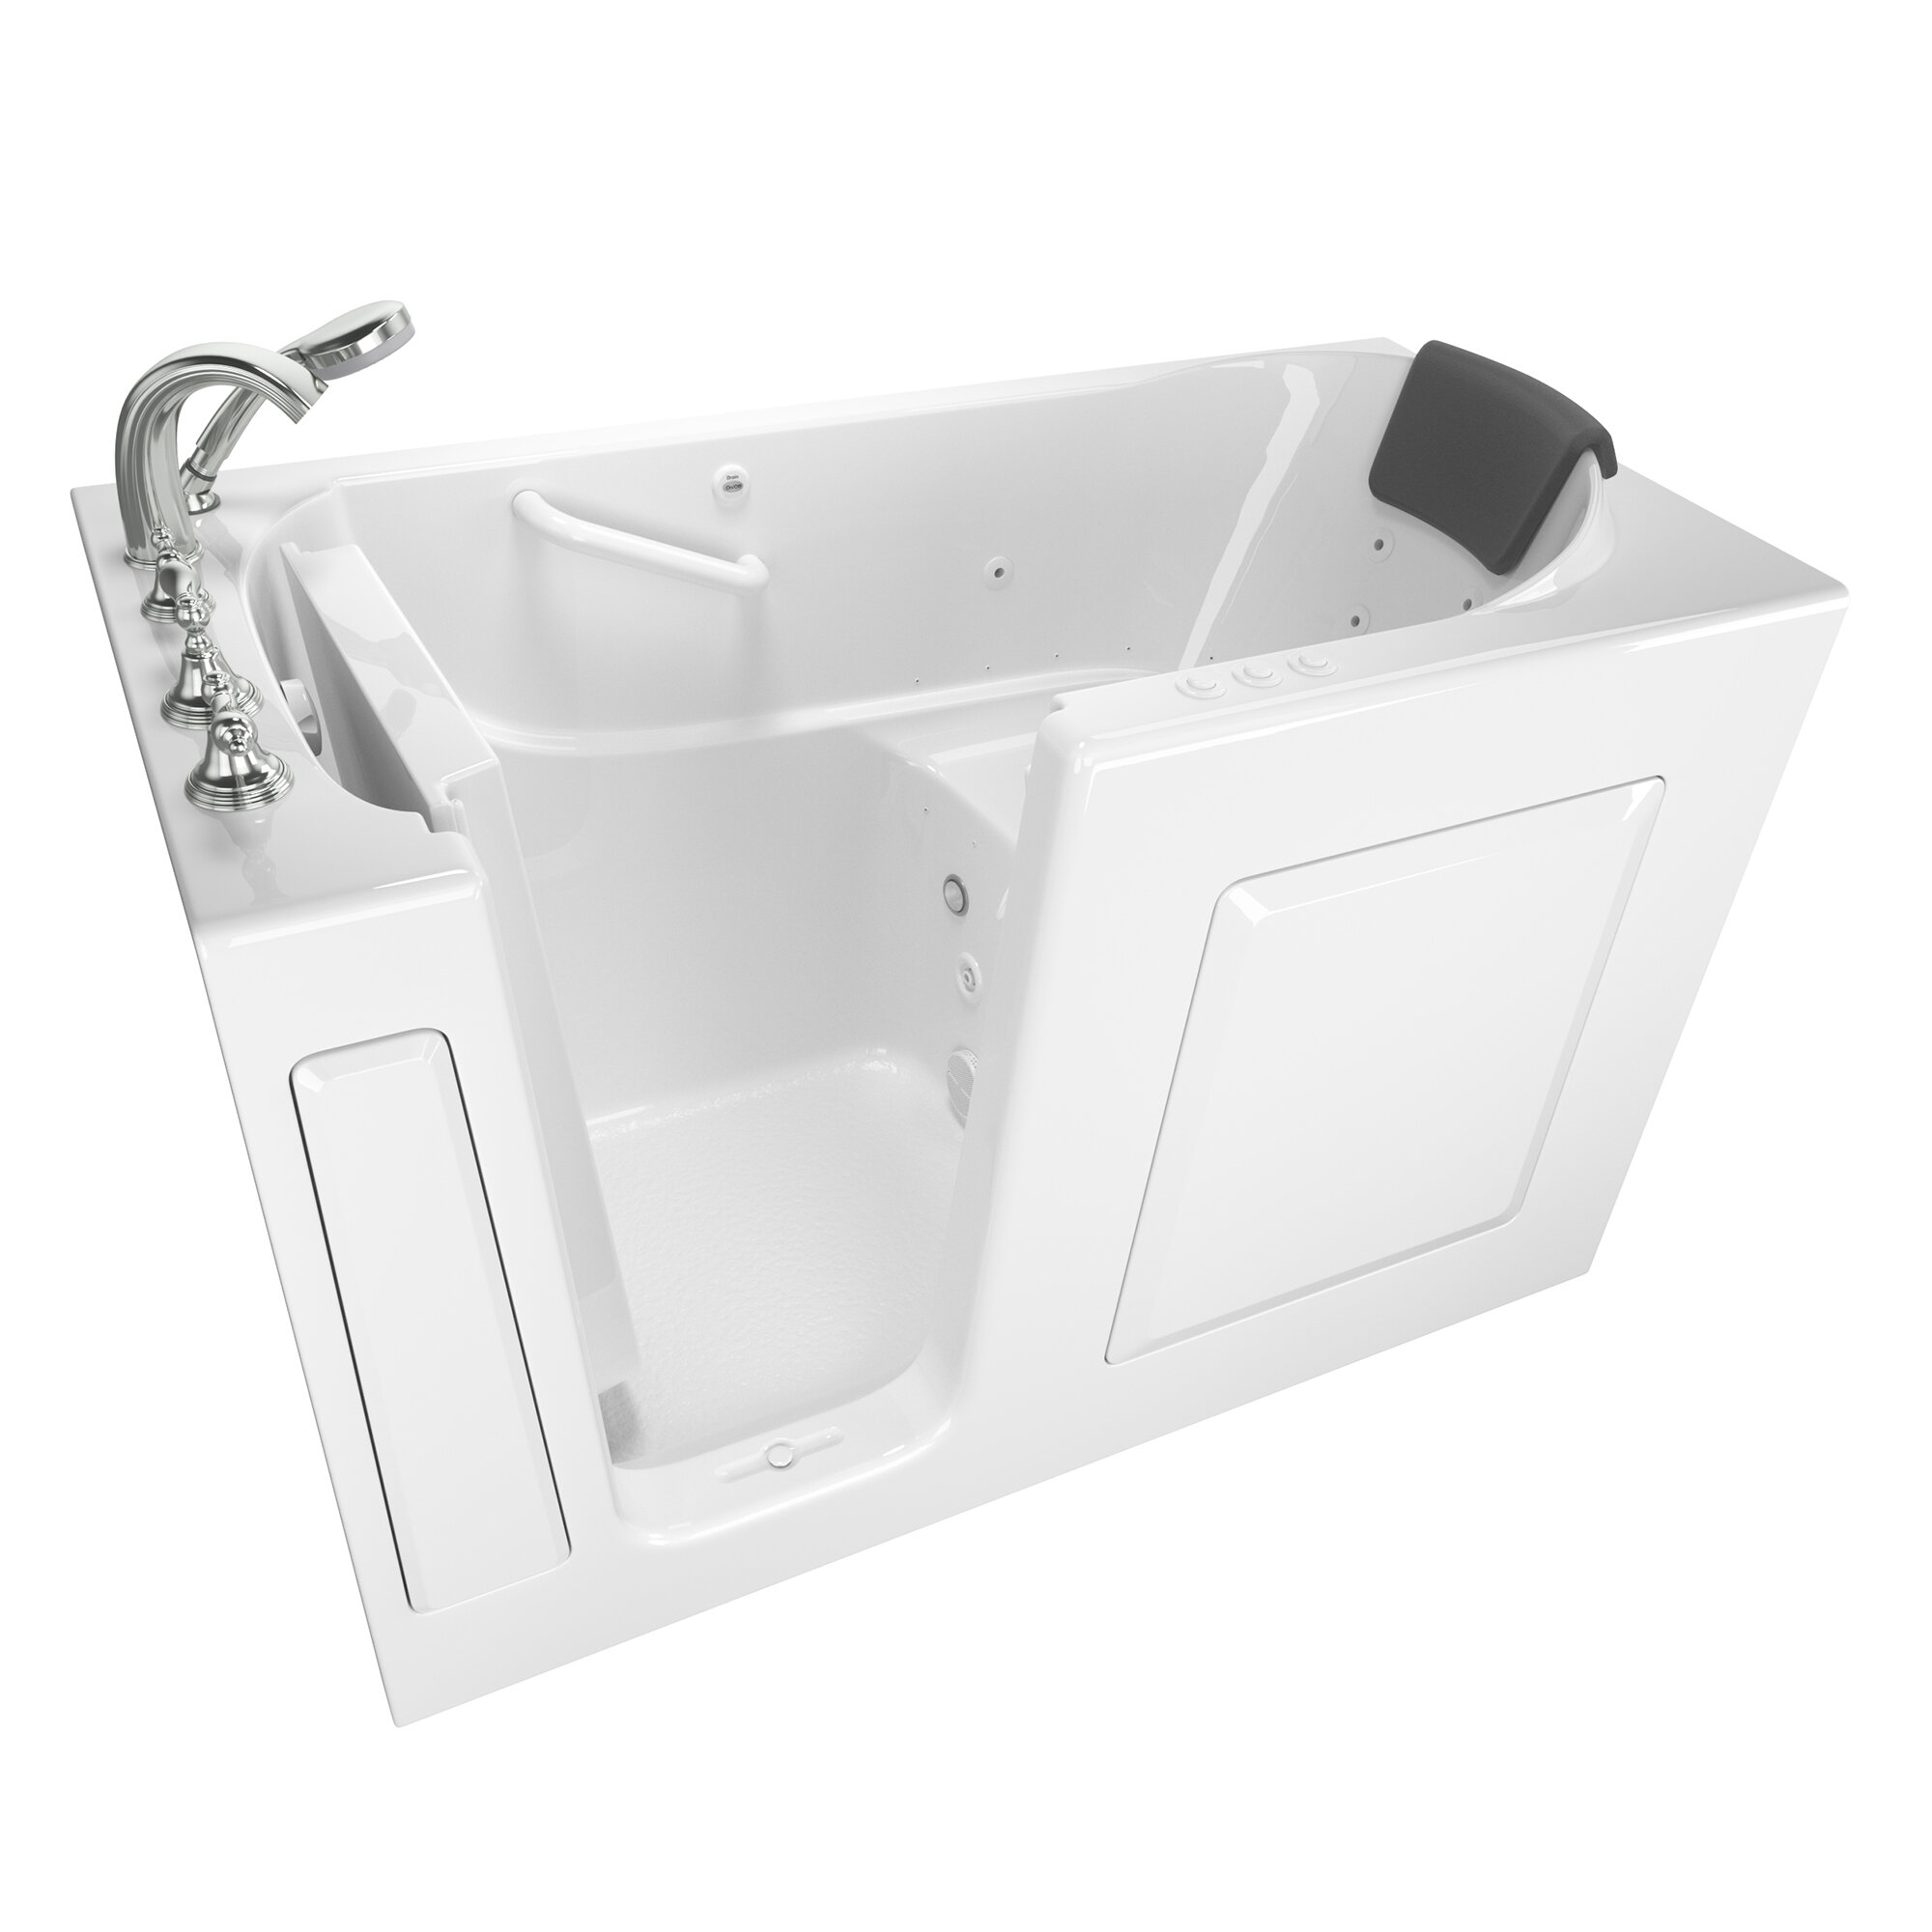 American Standard 60 X 30 Walk In Combination Fiberglass Bathtub With Faucet And Heater Reviews Wayfair